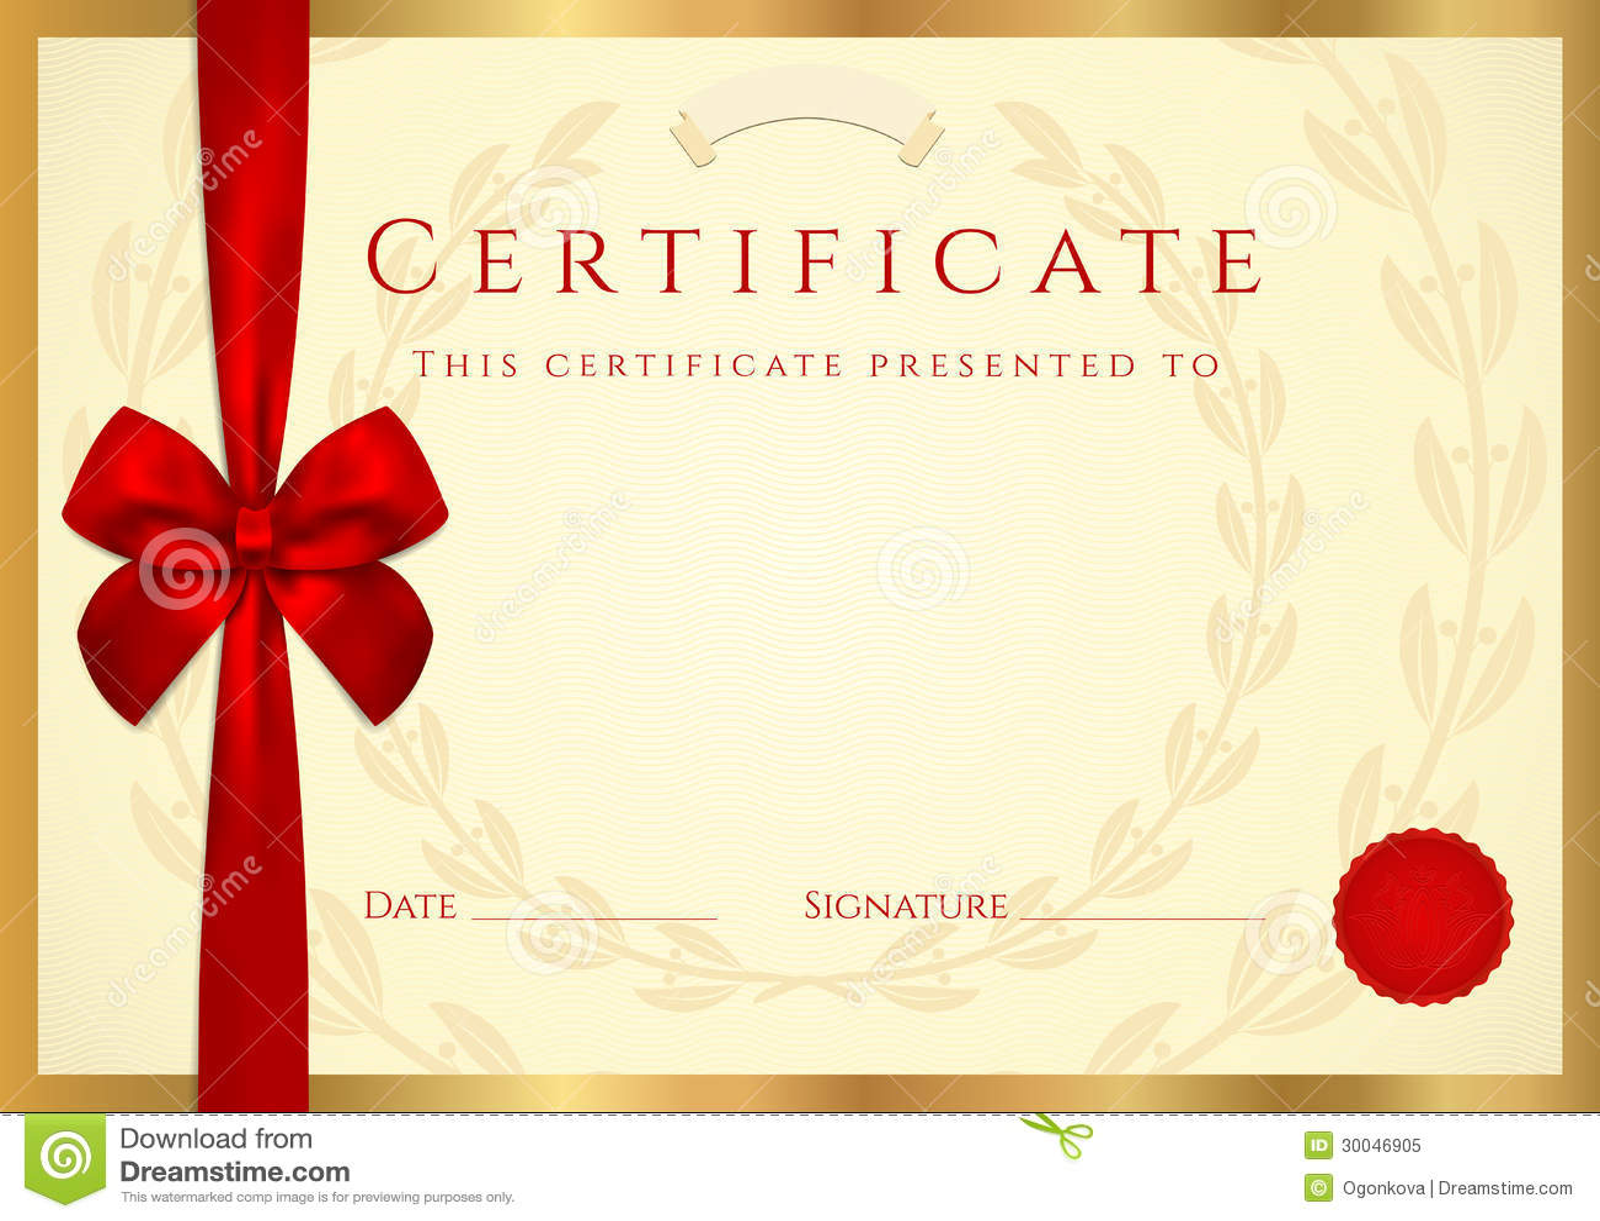 Zertifikat. Diplom. Amtliche Urkunde. Vektor. Vektor Abbildung ...